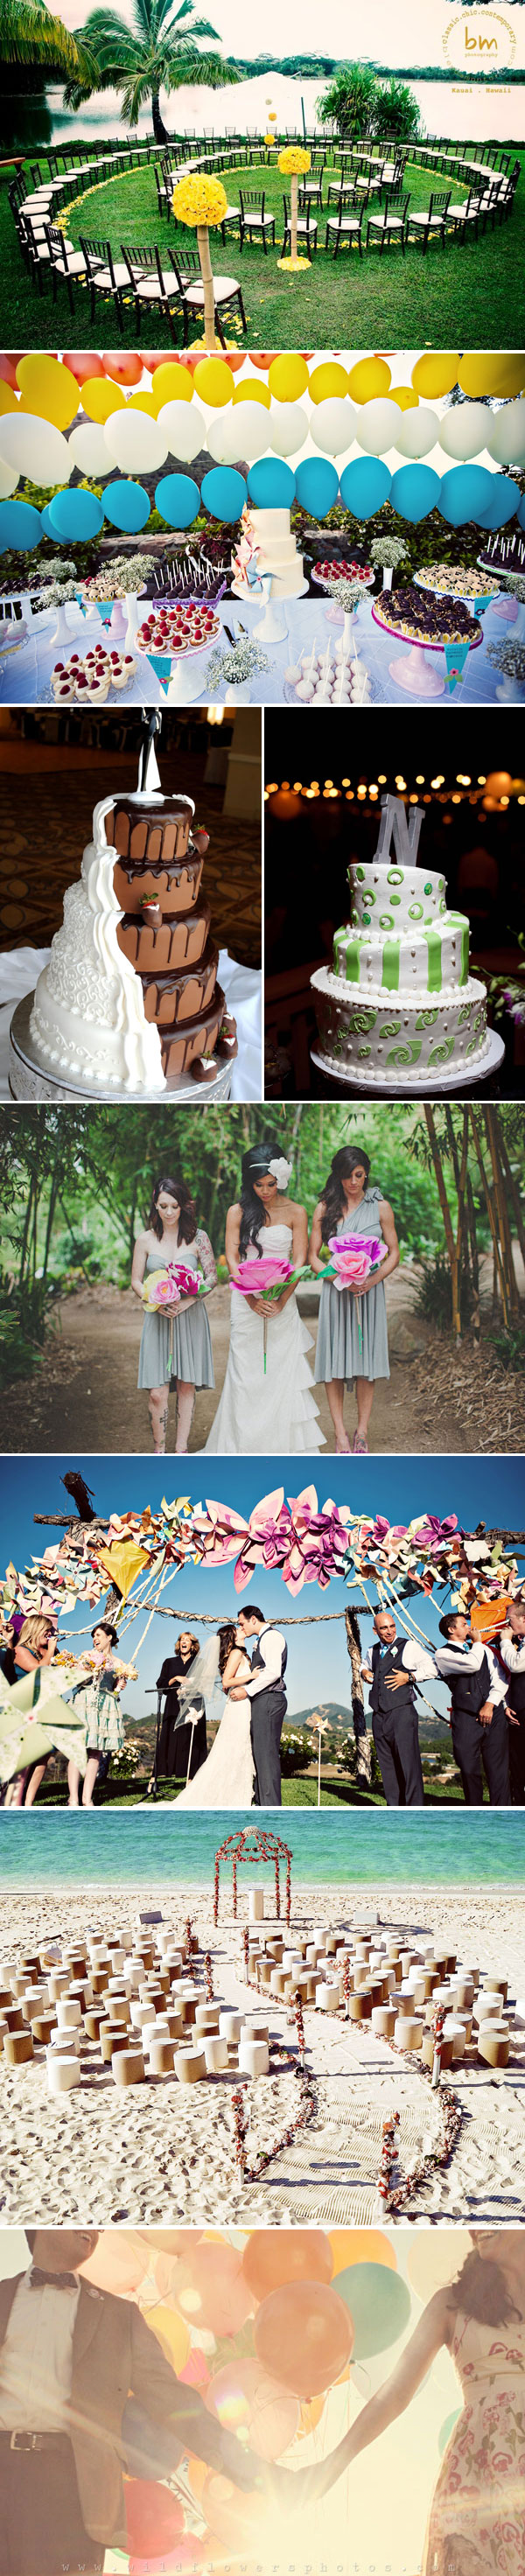 whimsical-wedding-style (1)